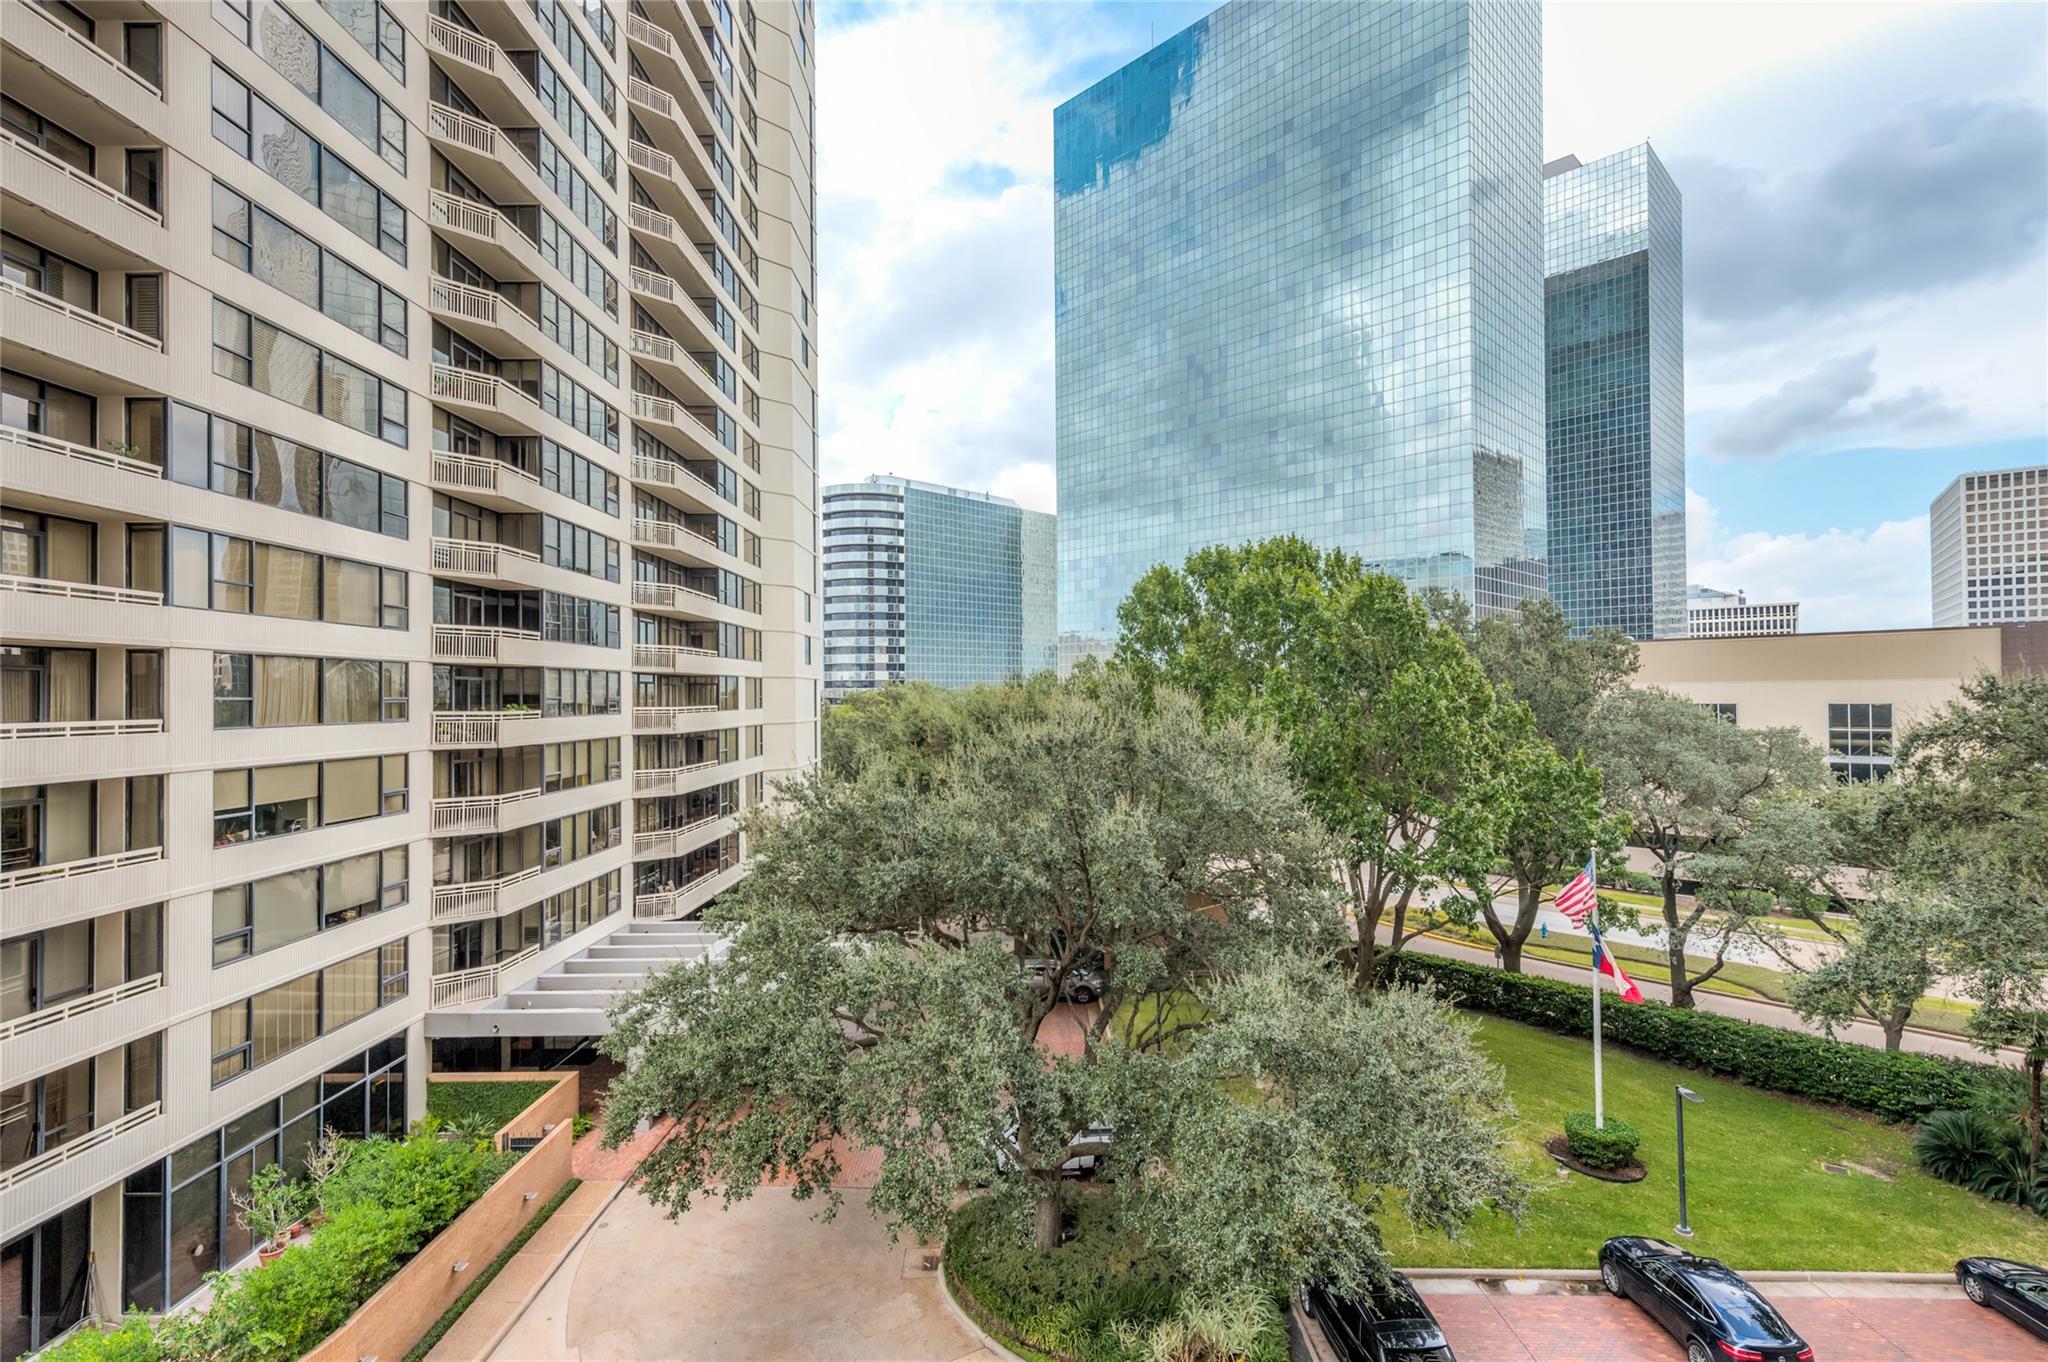 15 Greenway Plaza #5E Property Photo - Houston, TX real estate listing